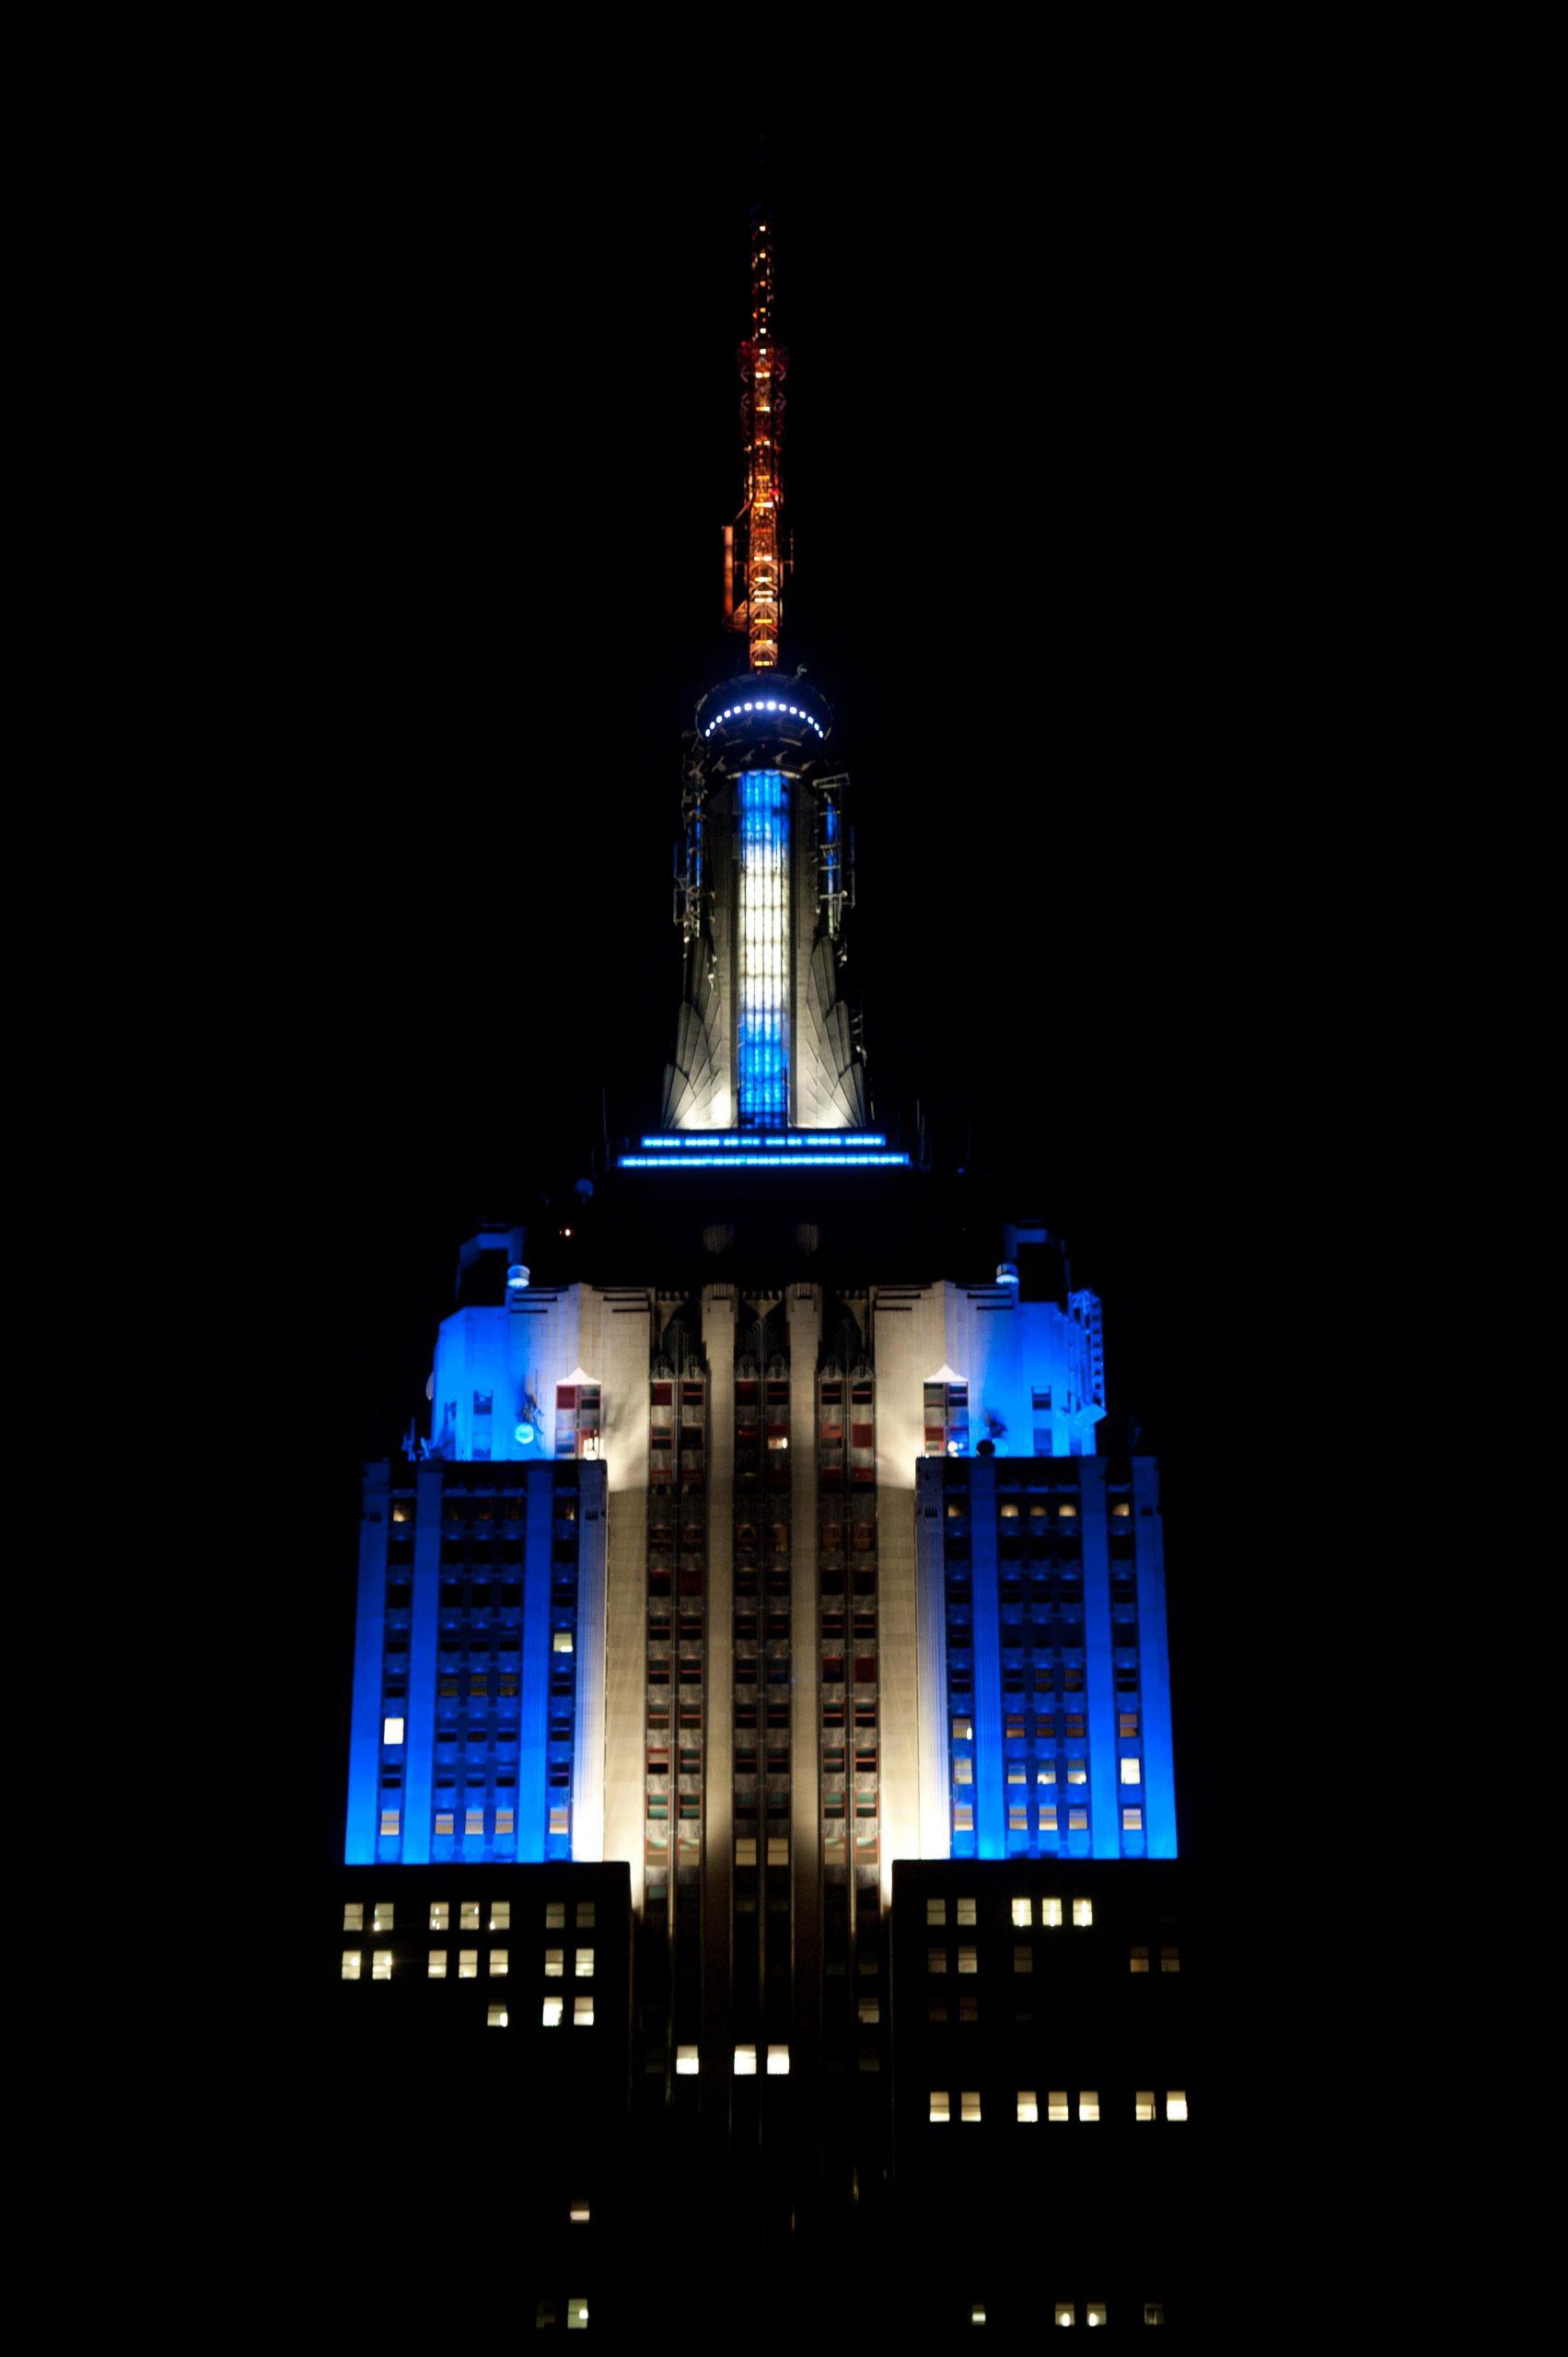 Tower Lighting 2015 12 06 00:00:00 | Empire State Building Regarding Empire State Building Lights Schedule